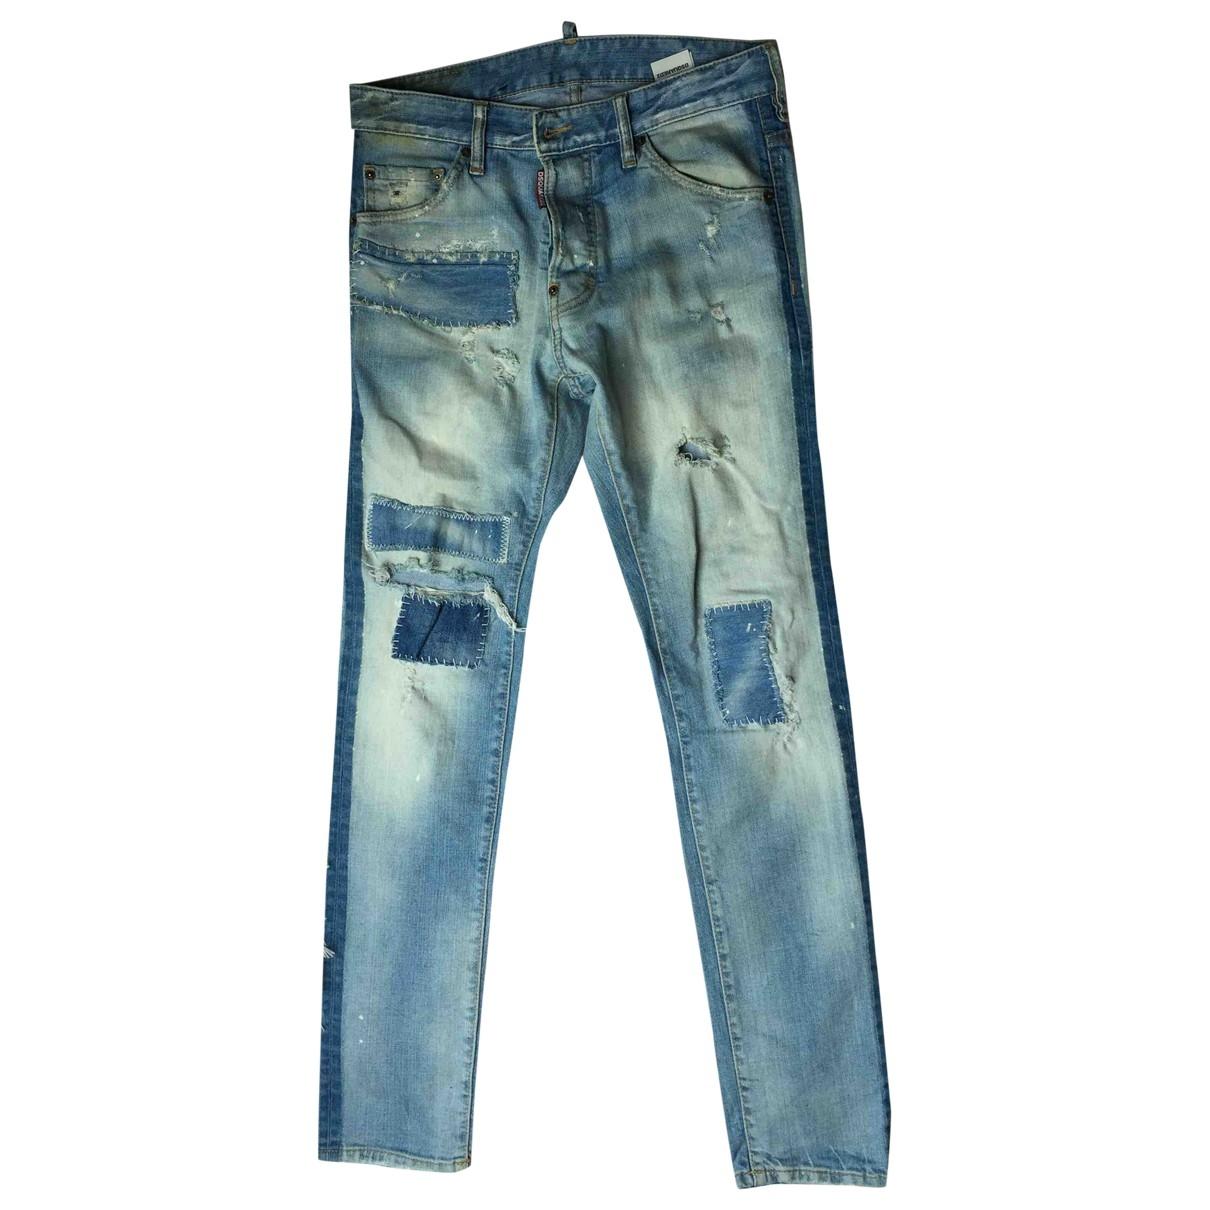 Dsquared2 \N Blue Cotton Jeans for Men 38 - 40 FR